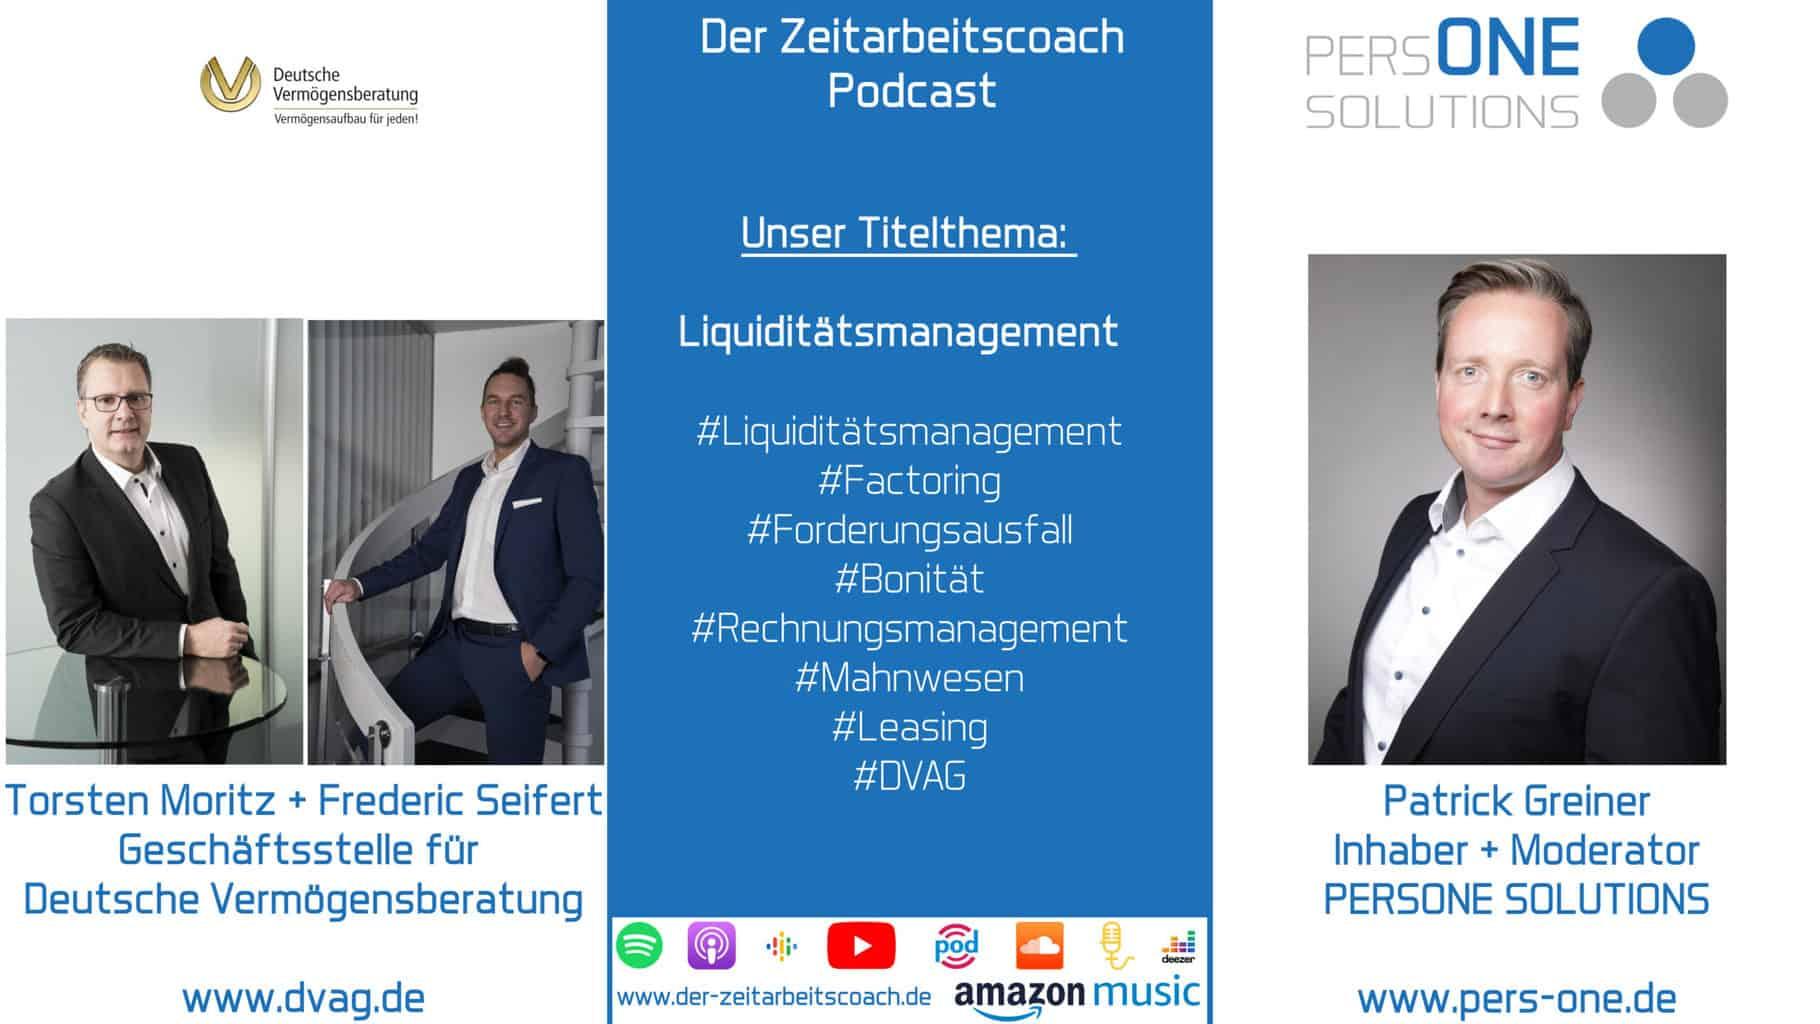 DVAG_Podcast YT Grafik-Interview_Zeitarbeitscoach-Podcast